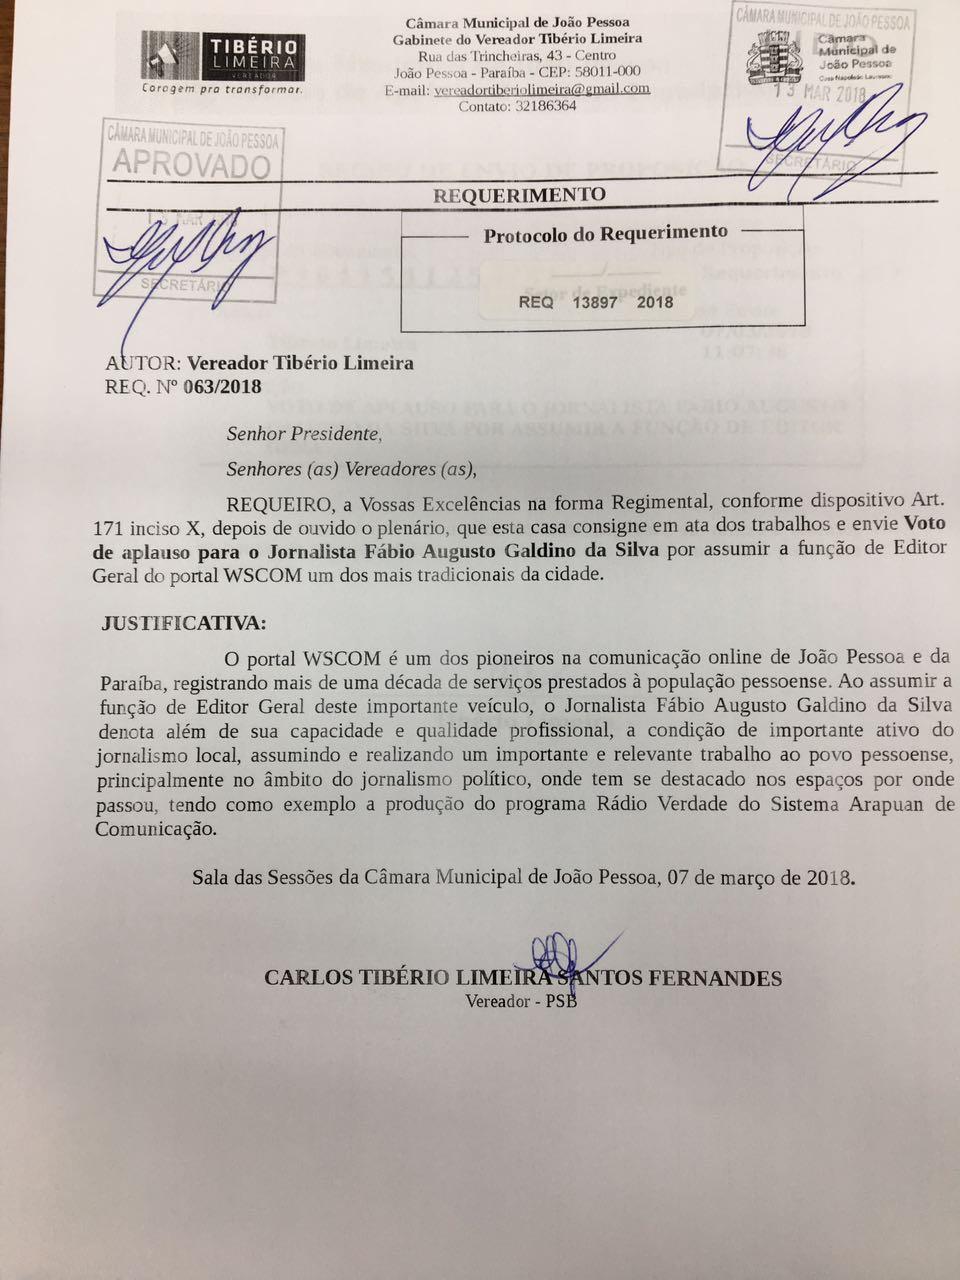 Jornalista Fábio Augusto recebe Voto de Aplauso na CMJP após nova ascensão na profissão